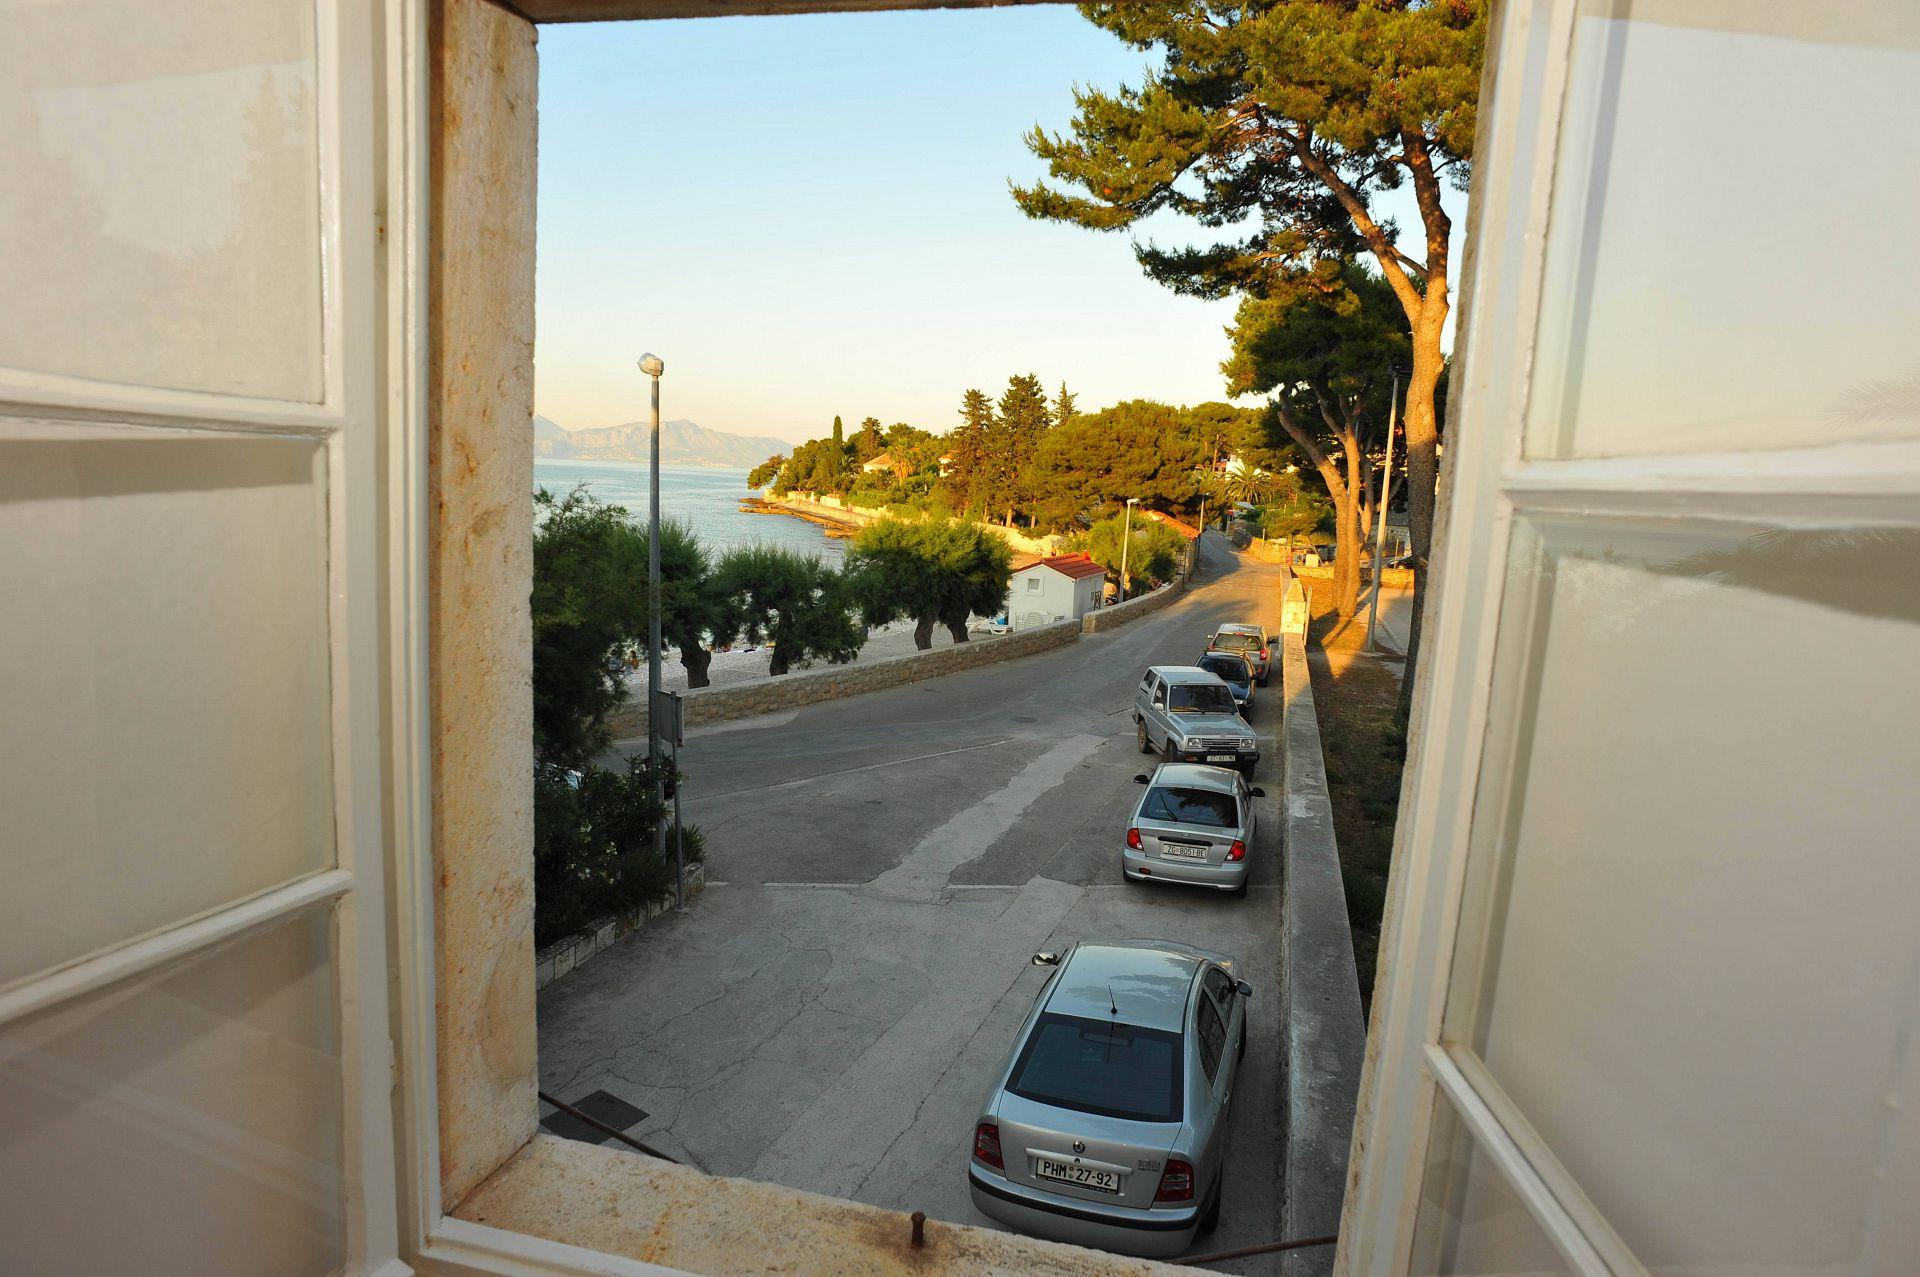 01501SUTI - Sutivan - Appartements Croatie - A2(6): vue de la fenêtre